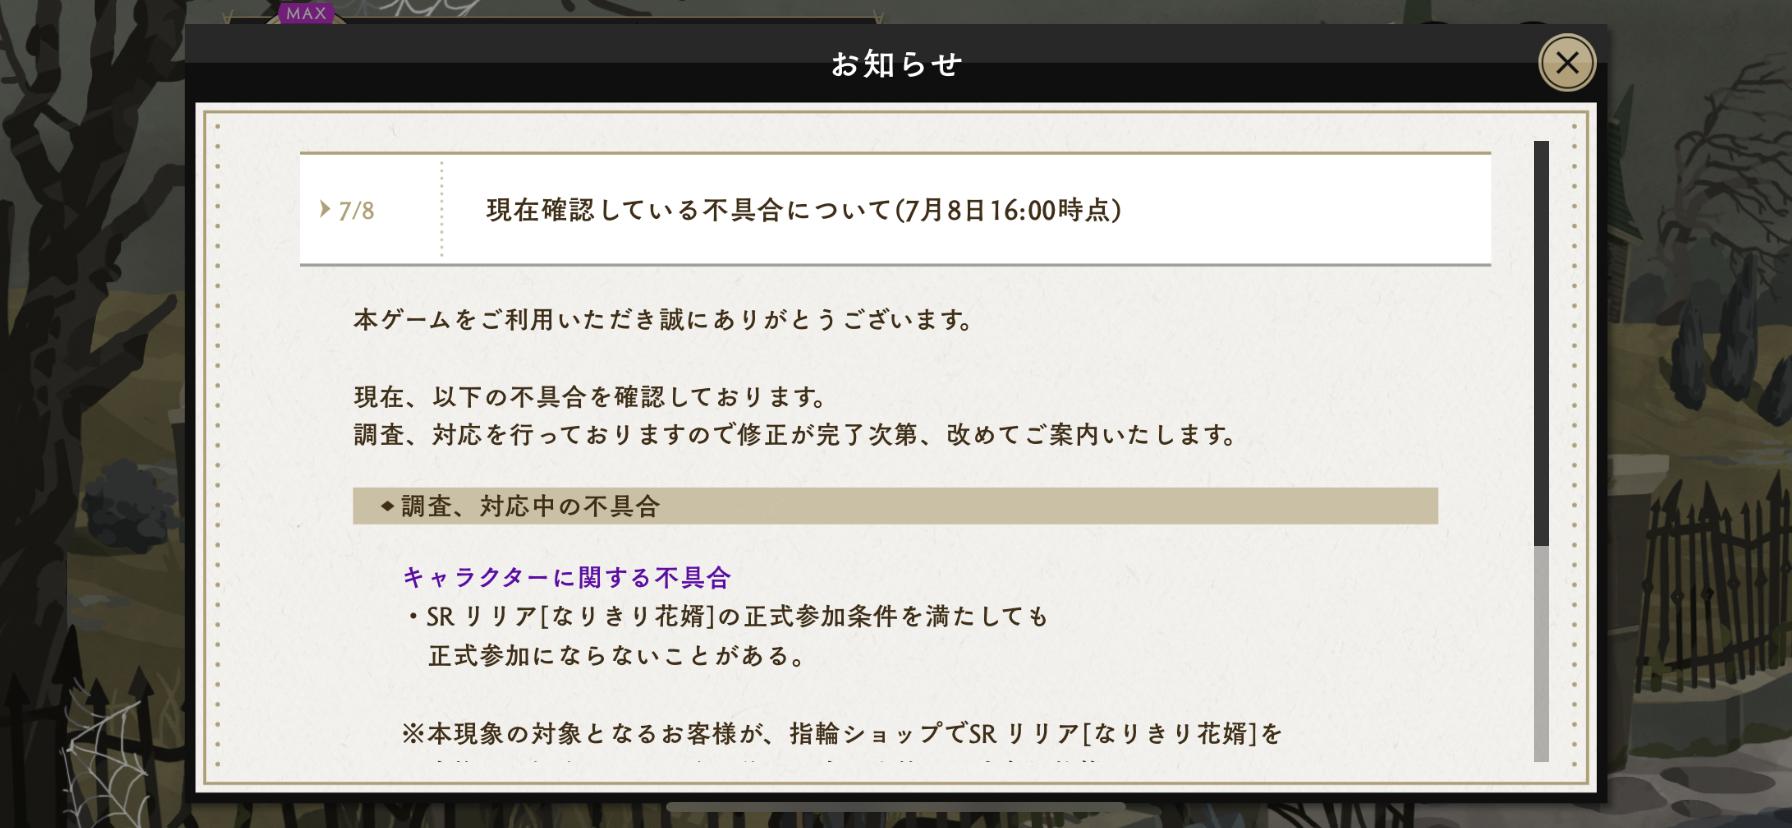 f:id:motimoti444:20210709095614p:plain